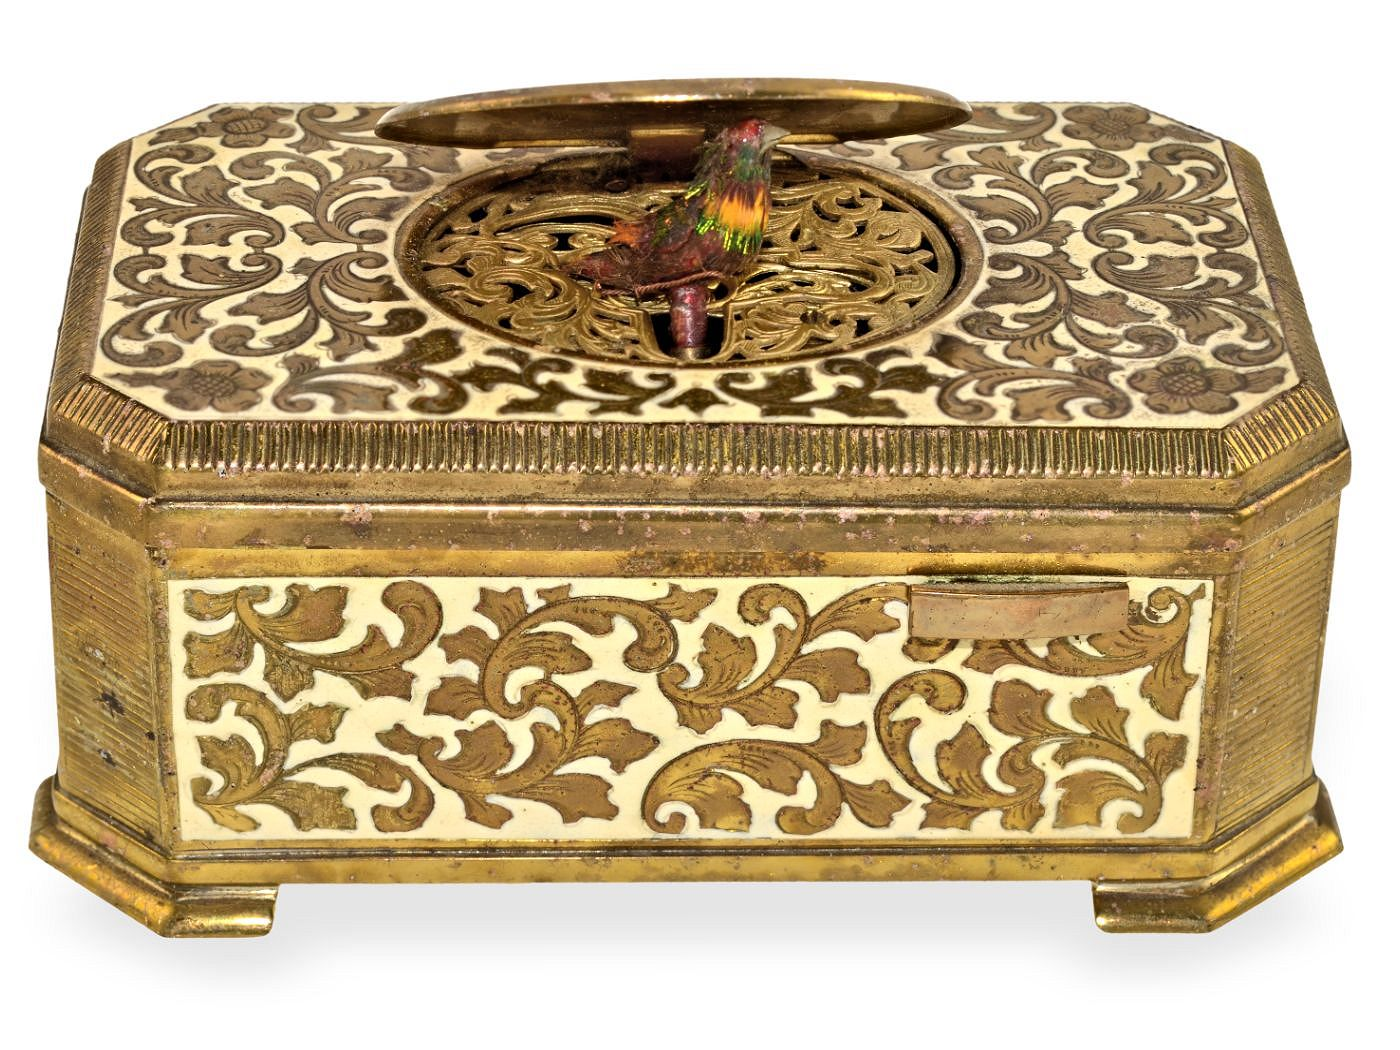 Singing bird box: extremely rare enameled singing bird box, Griessbaum, enamel case by Emil Brenk (1905-1988)-